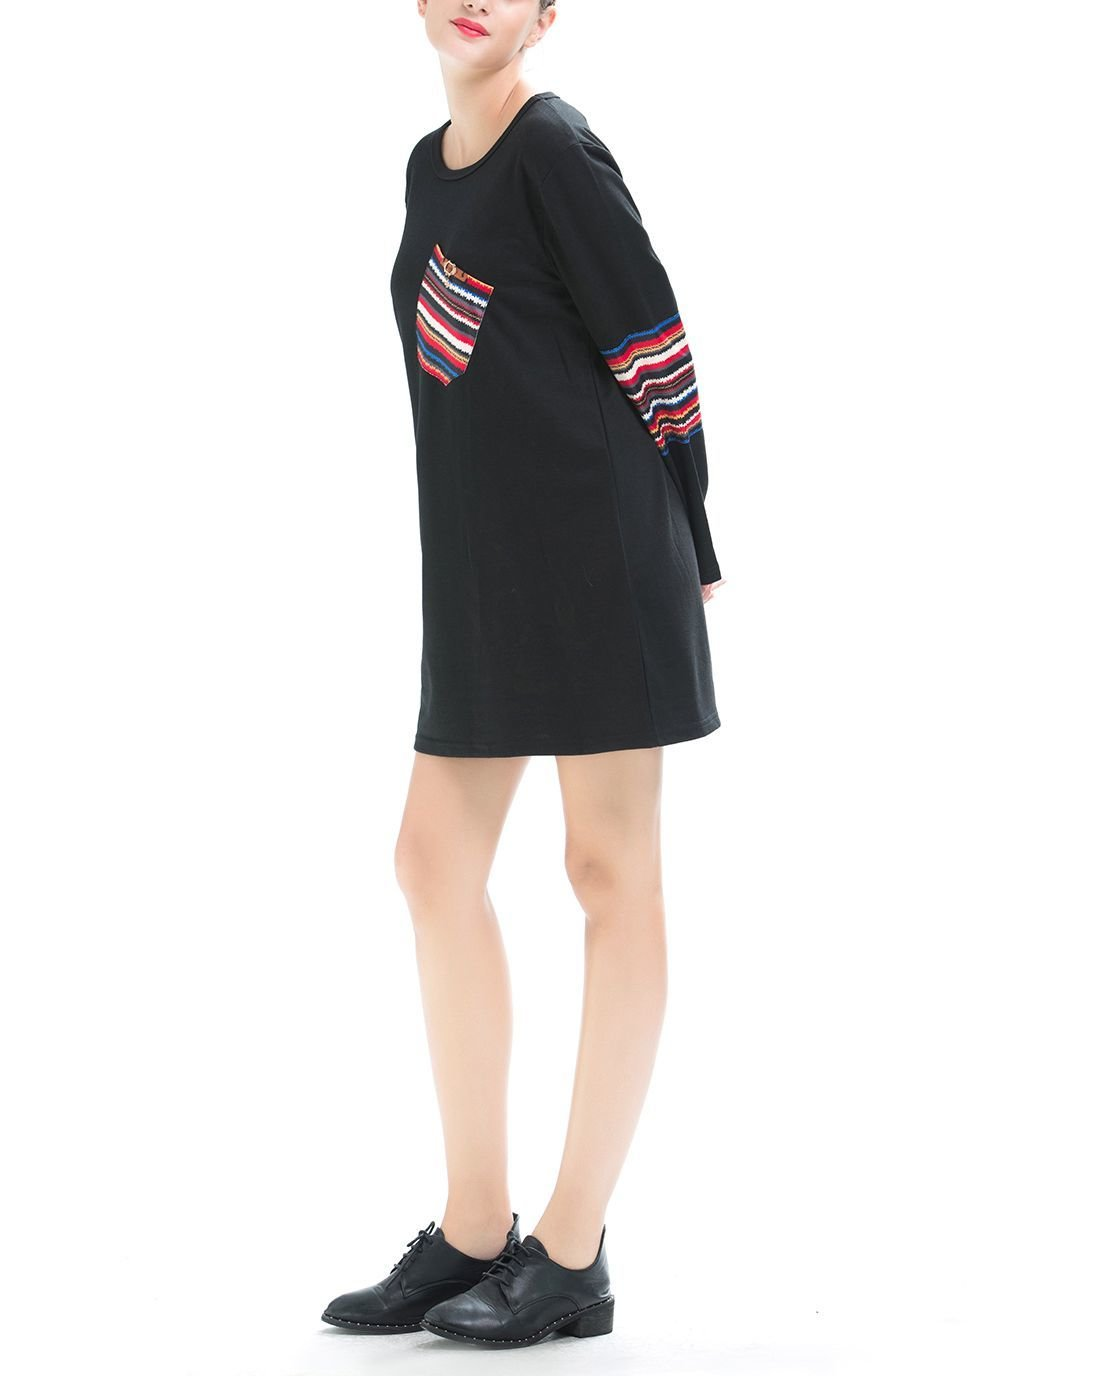 Large Size Tee in Tunic or Mini Dress Length